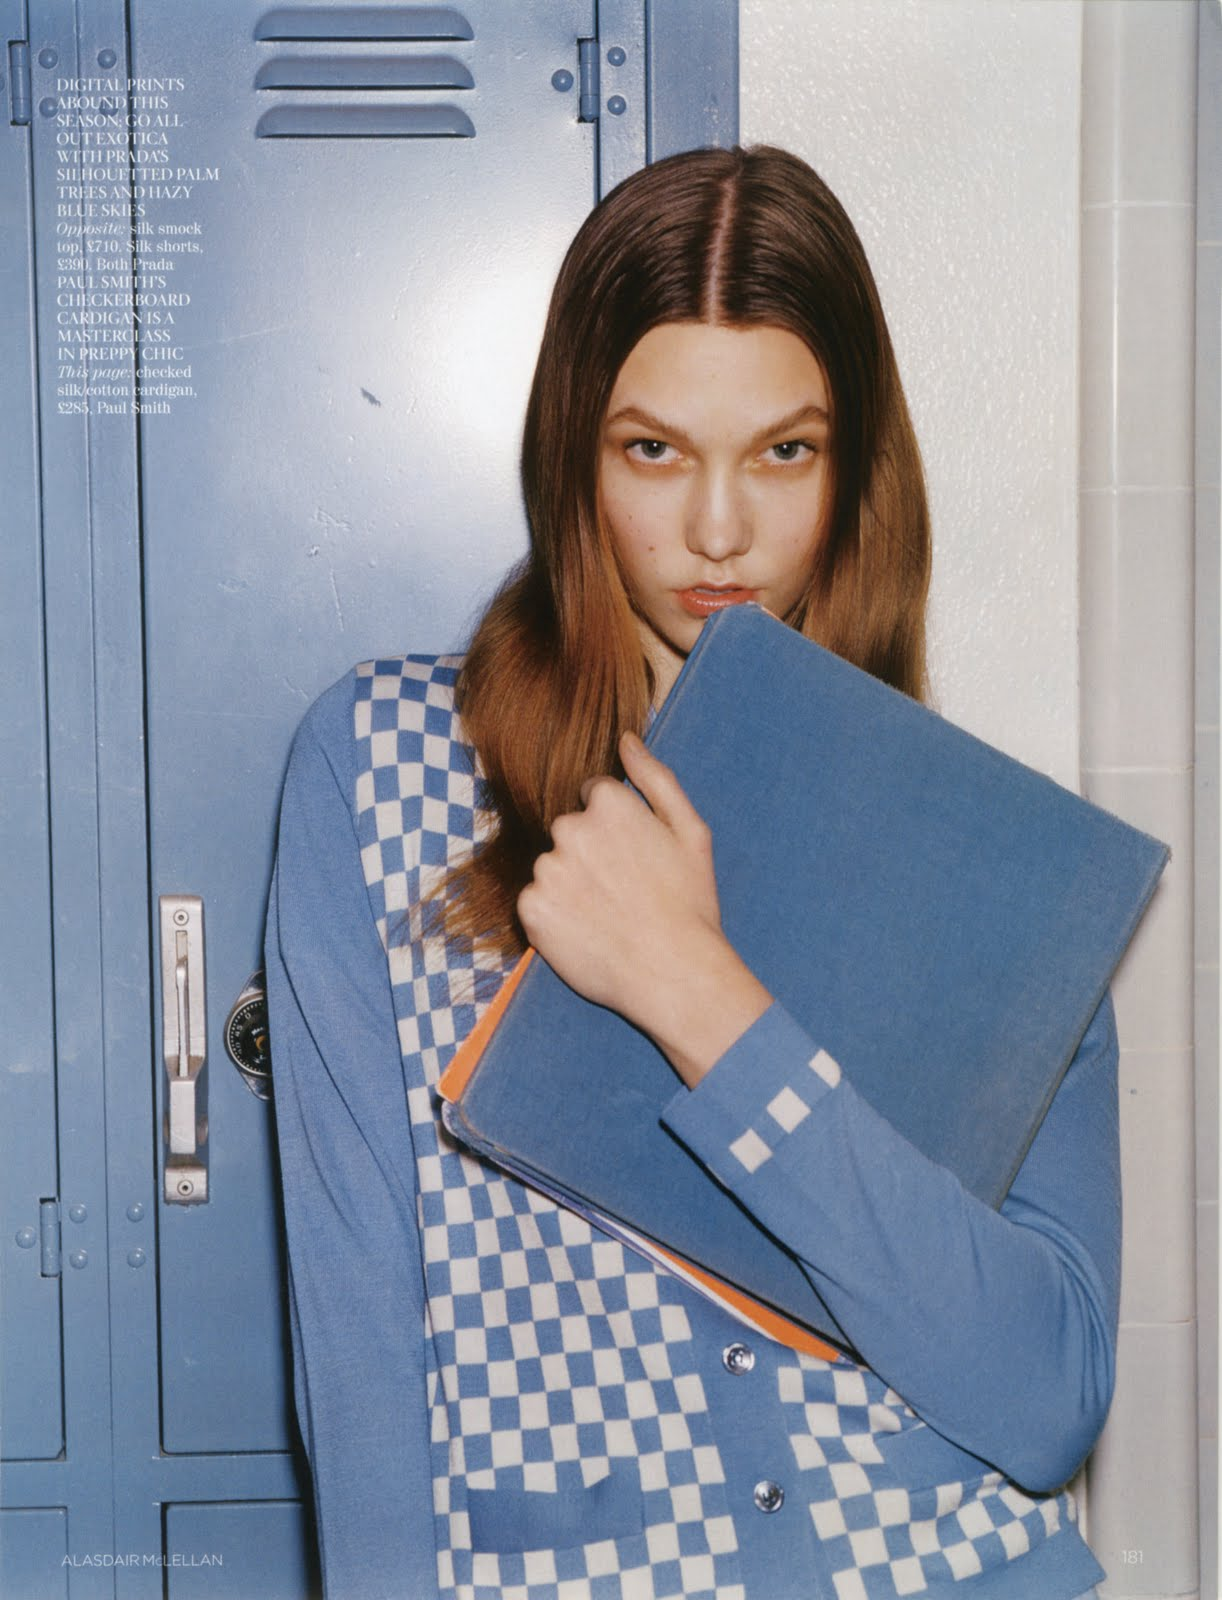 Karlie Kloss for British Vogue. Image  via